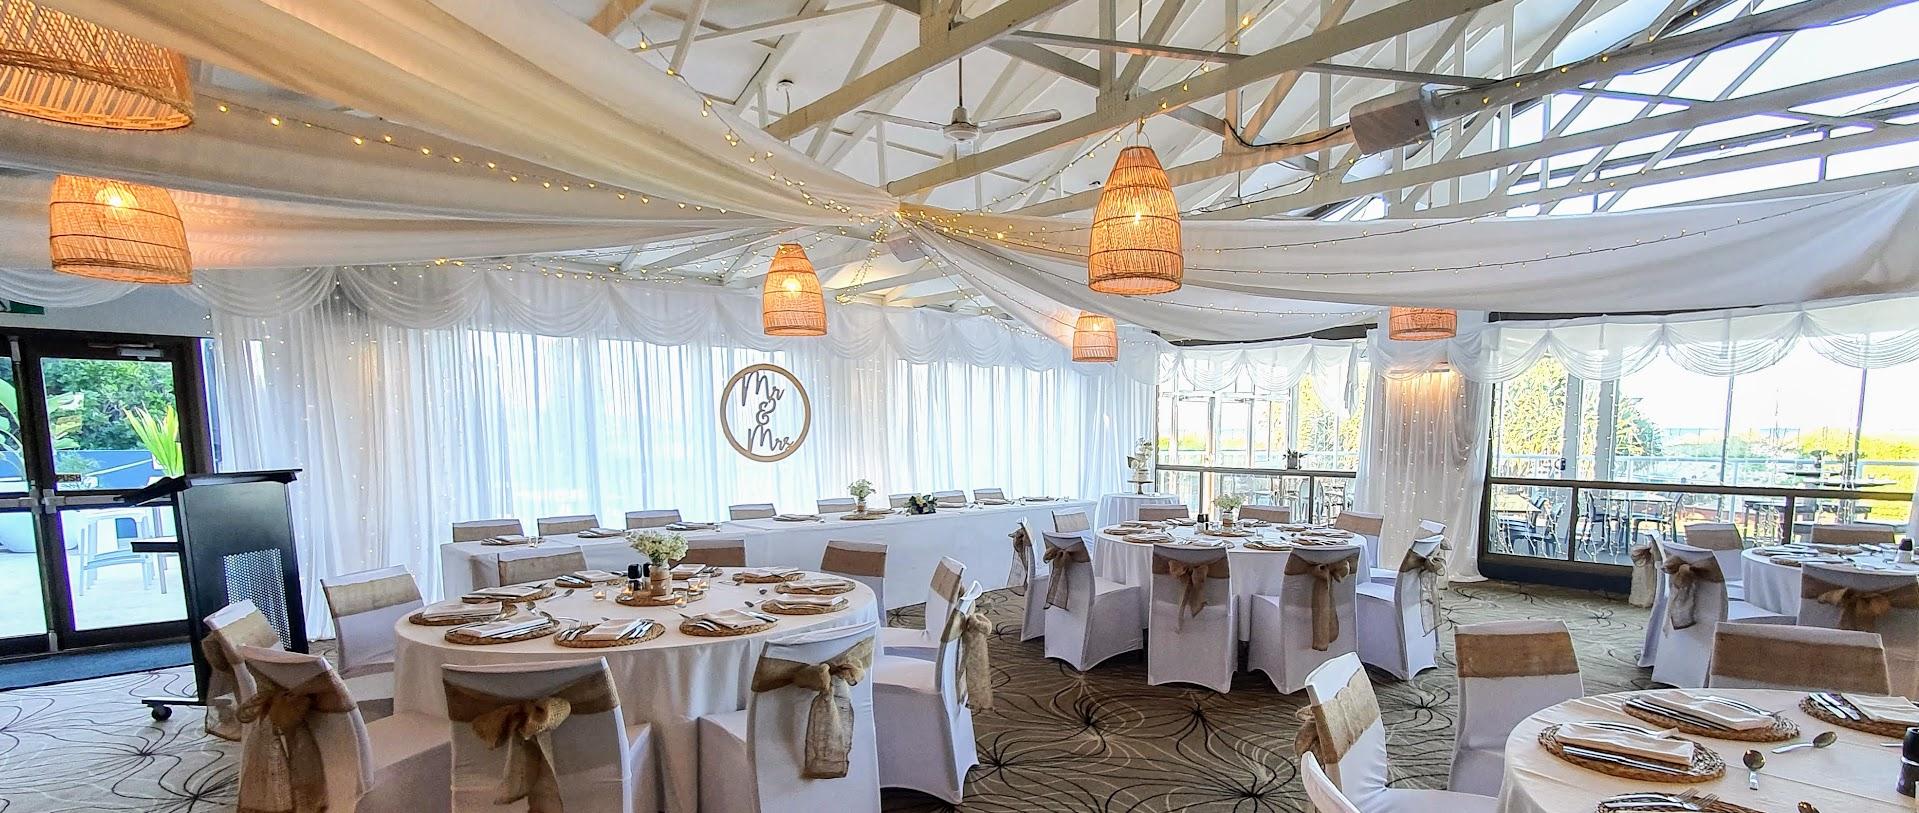 Ceiling Star fairy light + soft fabric,, chair covers burlap, full white satin backdrop, MR & MRS Sign